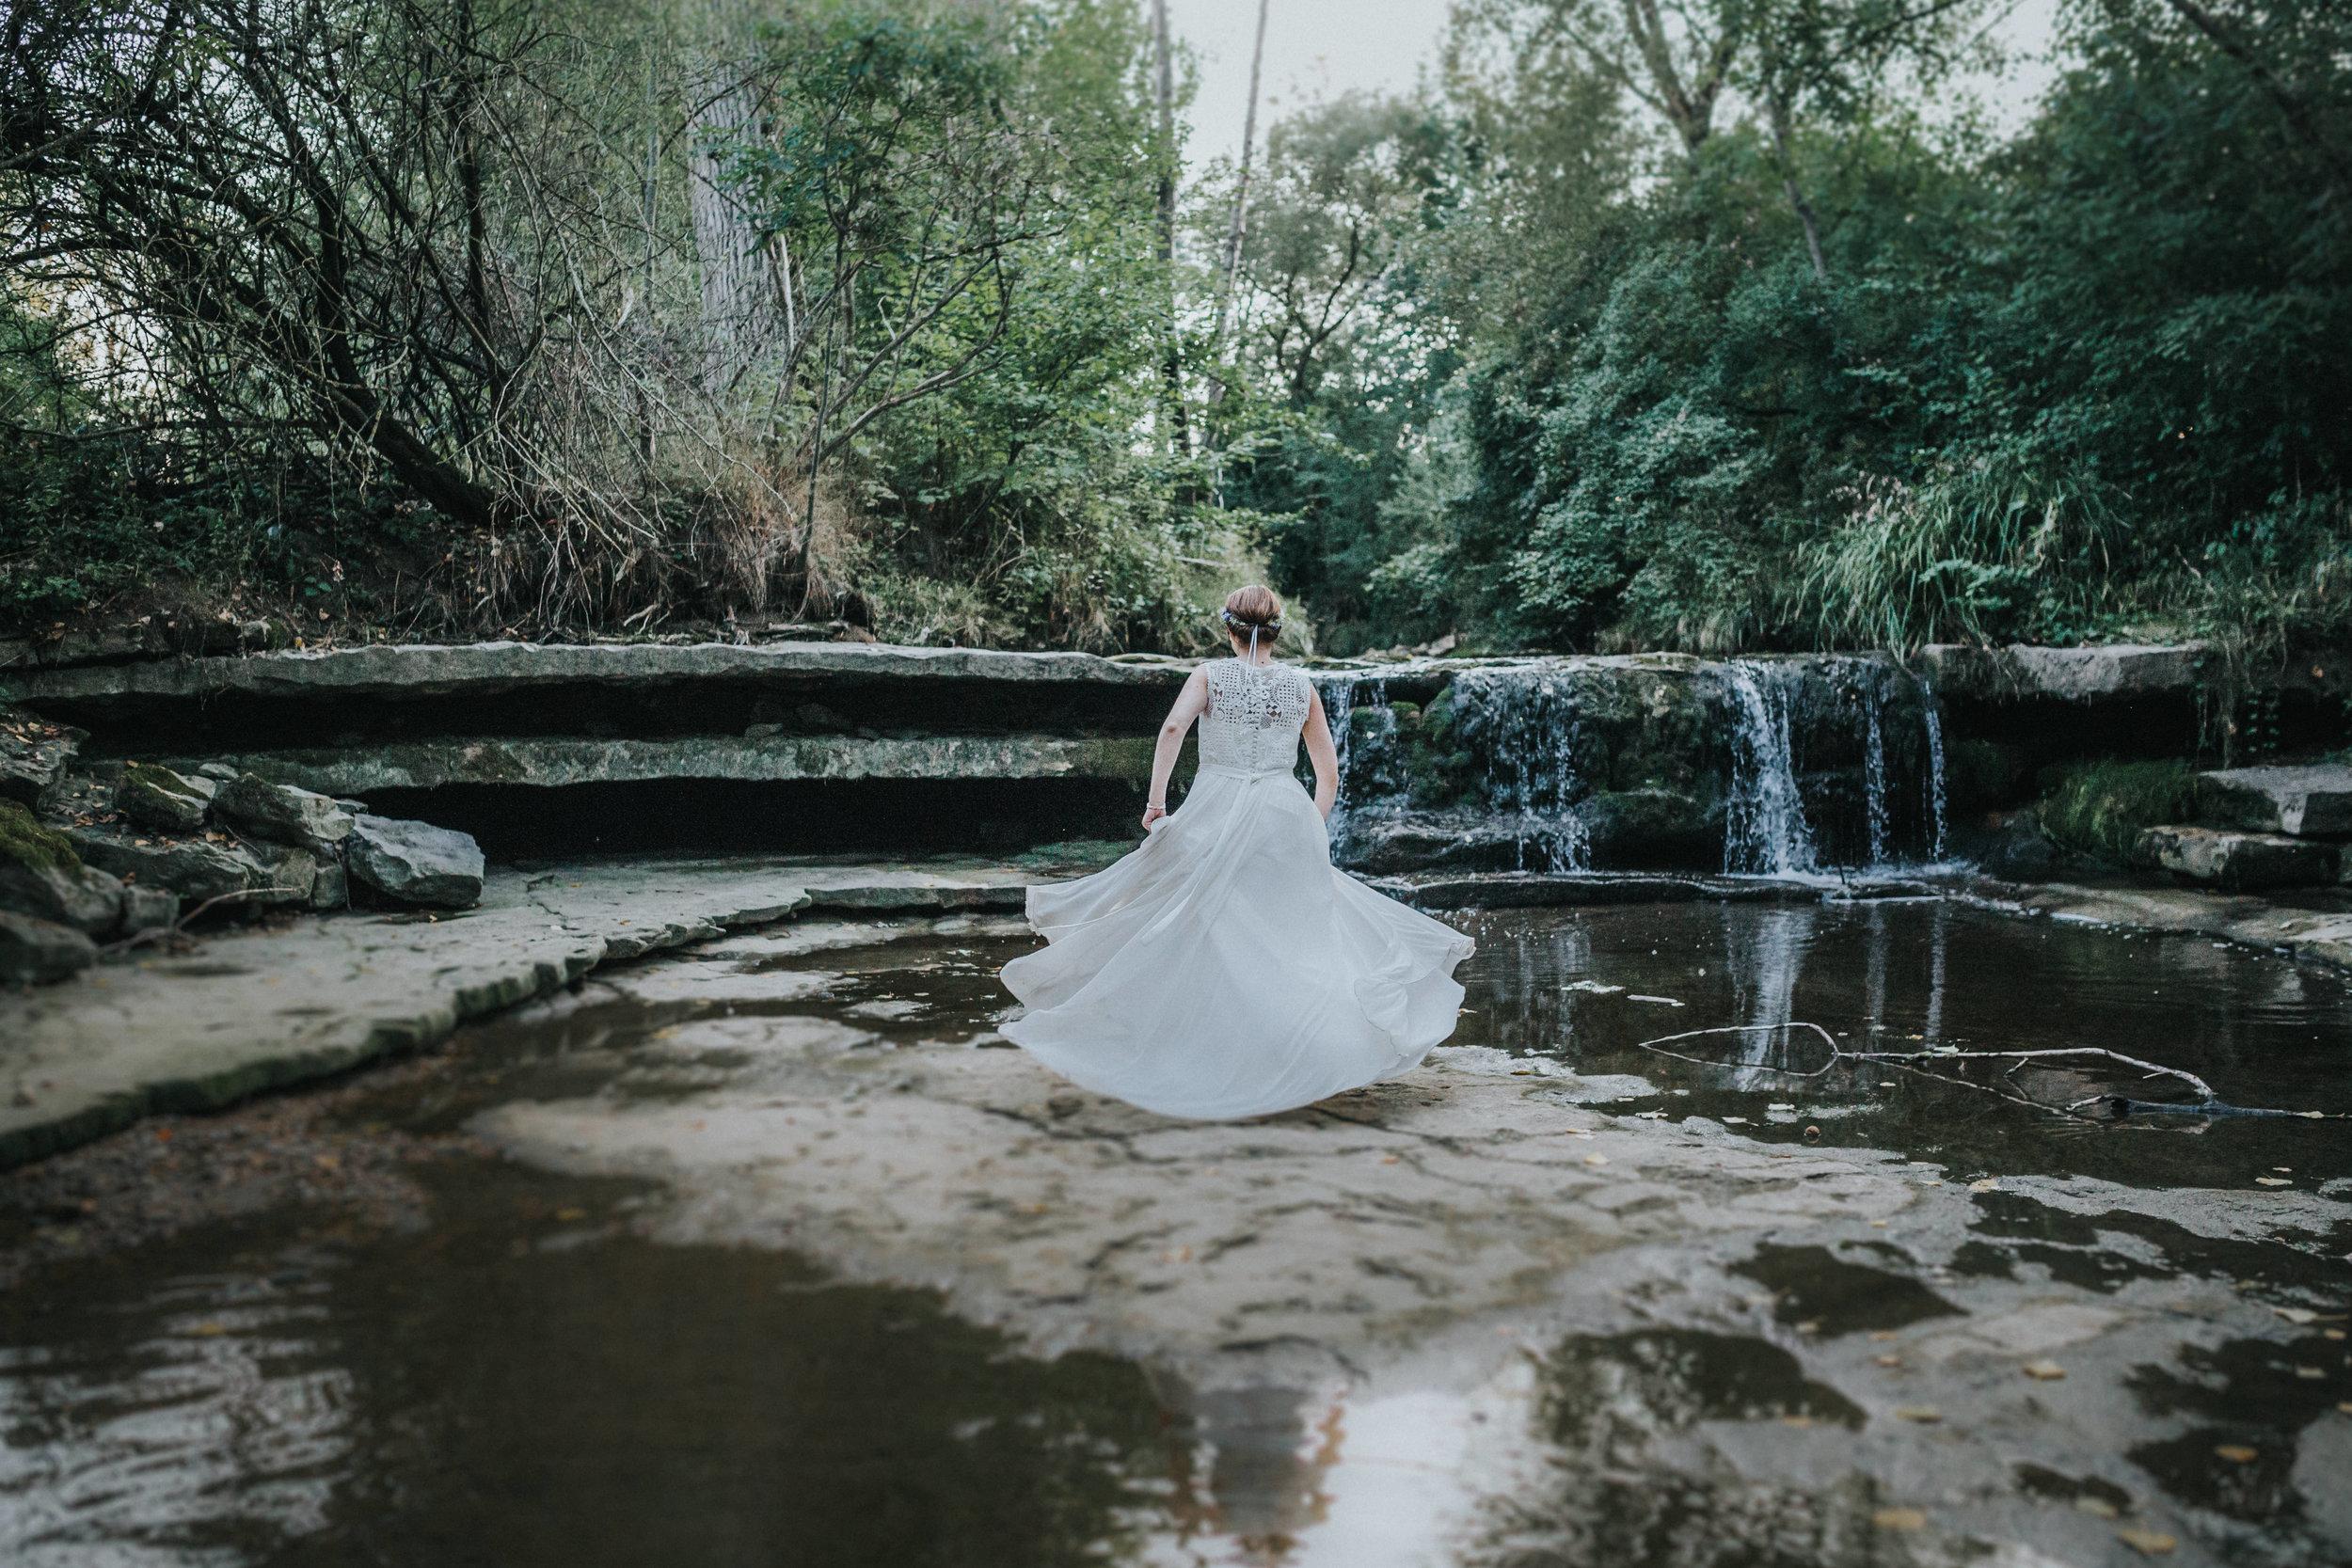 yessica-baur-fotografie-after-wedding-tübingen-109-1093.JPG